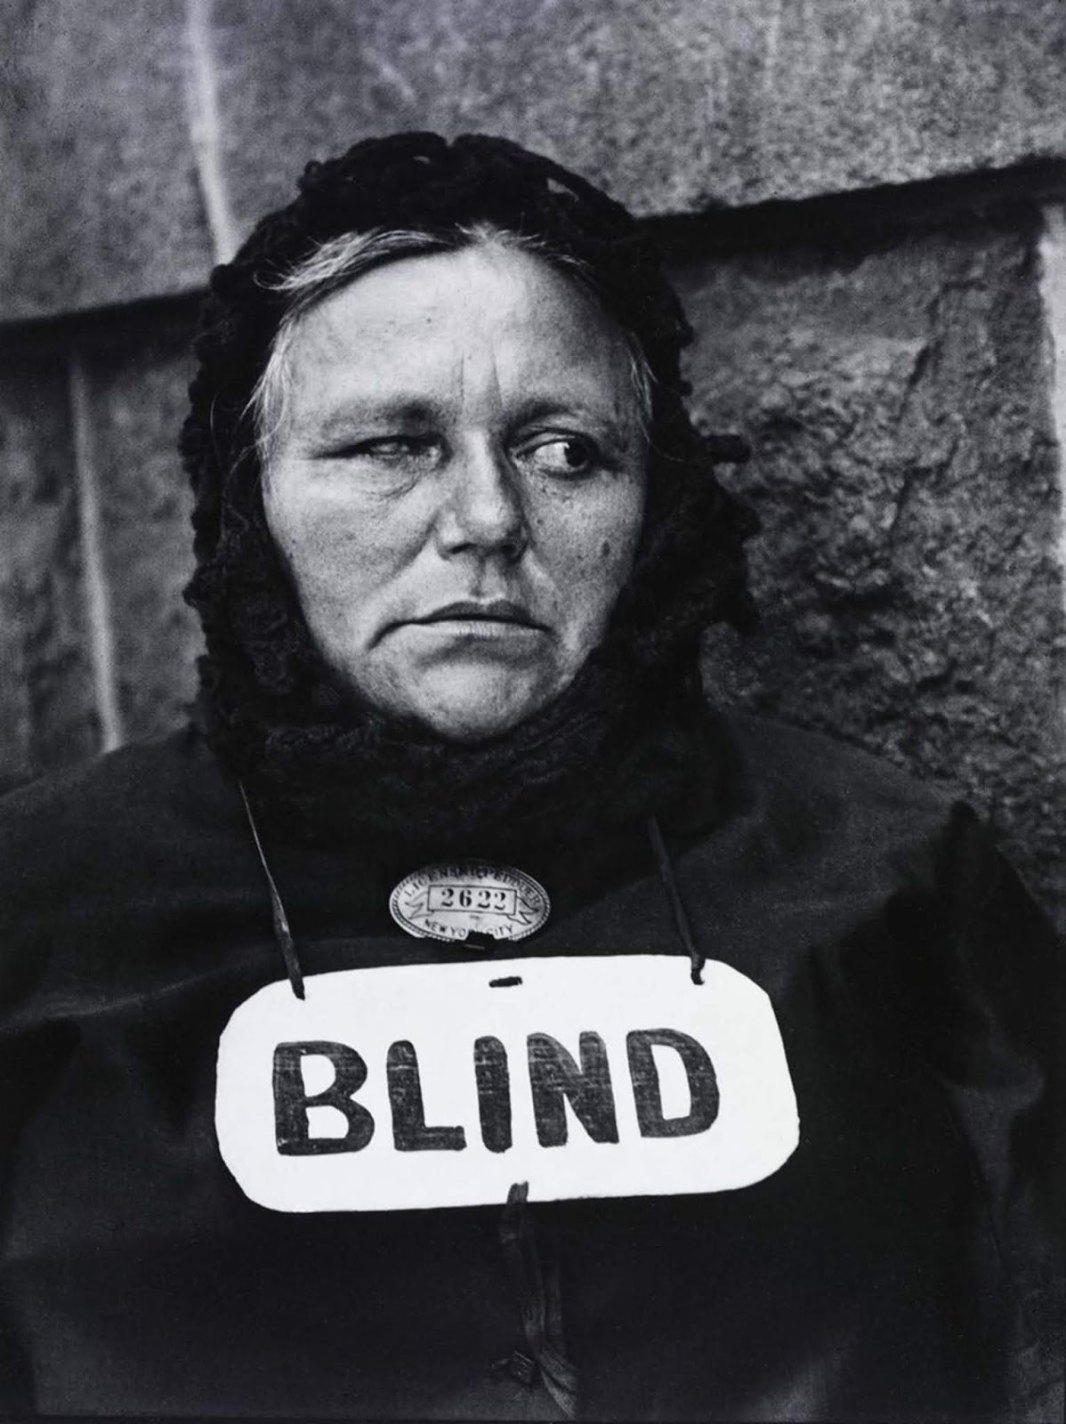 History photo Blind, Paul Strand, 1916